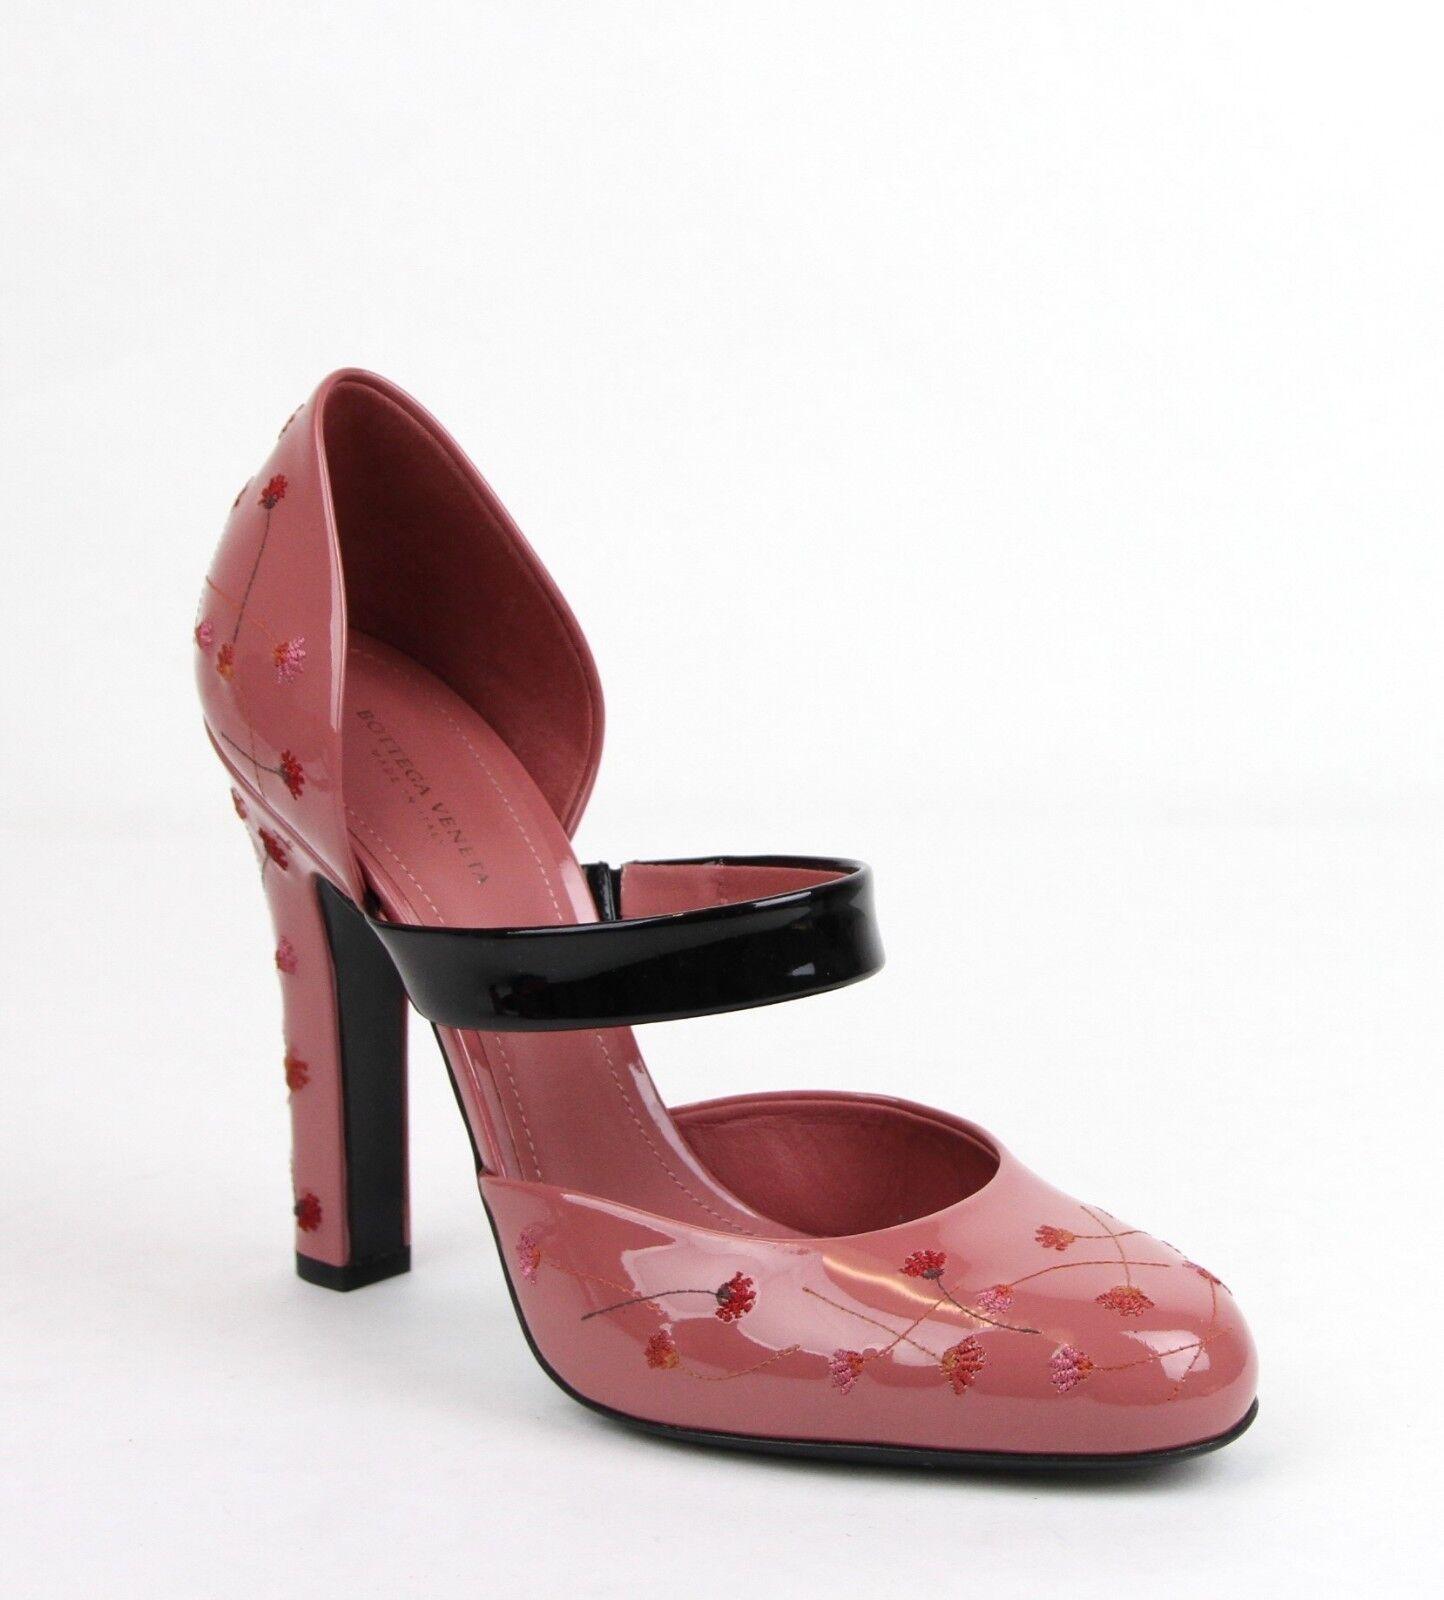 prezzi bassissimi    890 Bottega Veneta Donna  rosa Patent Leather Heels IT 40 US 10 451813 5771  salutare